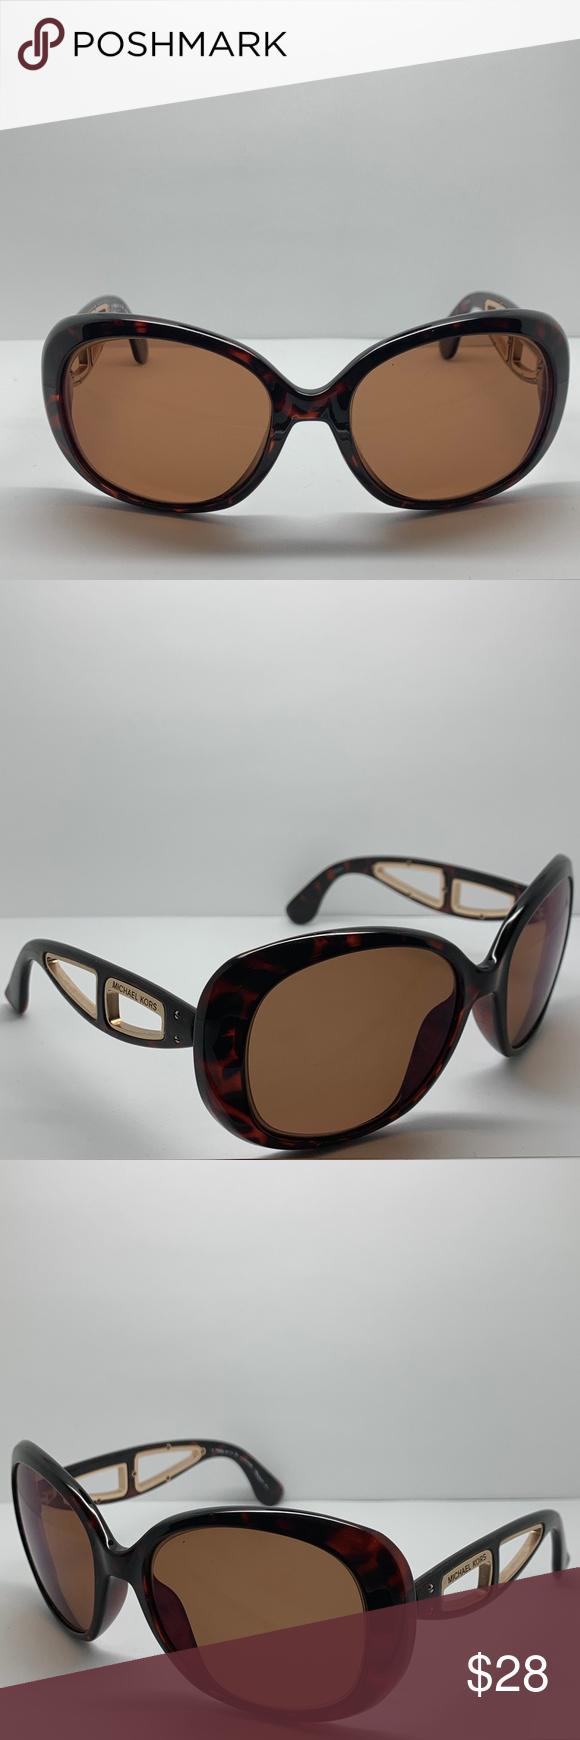 c9835c9521b4 Michael Kors Black Butterfly Sunglasses Frames Michael Kors Black Butterfly  Sunglasses Eyeglasses Frames **Listing